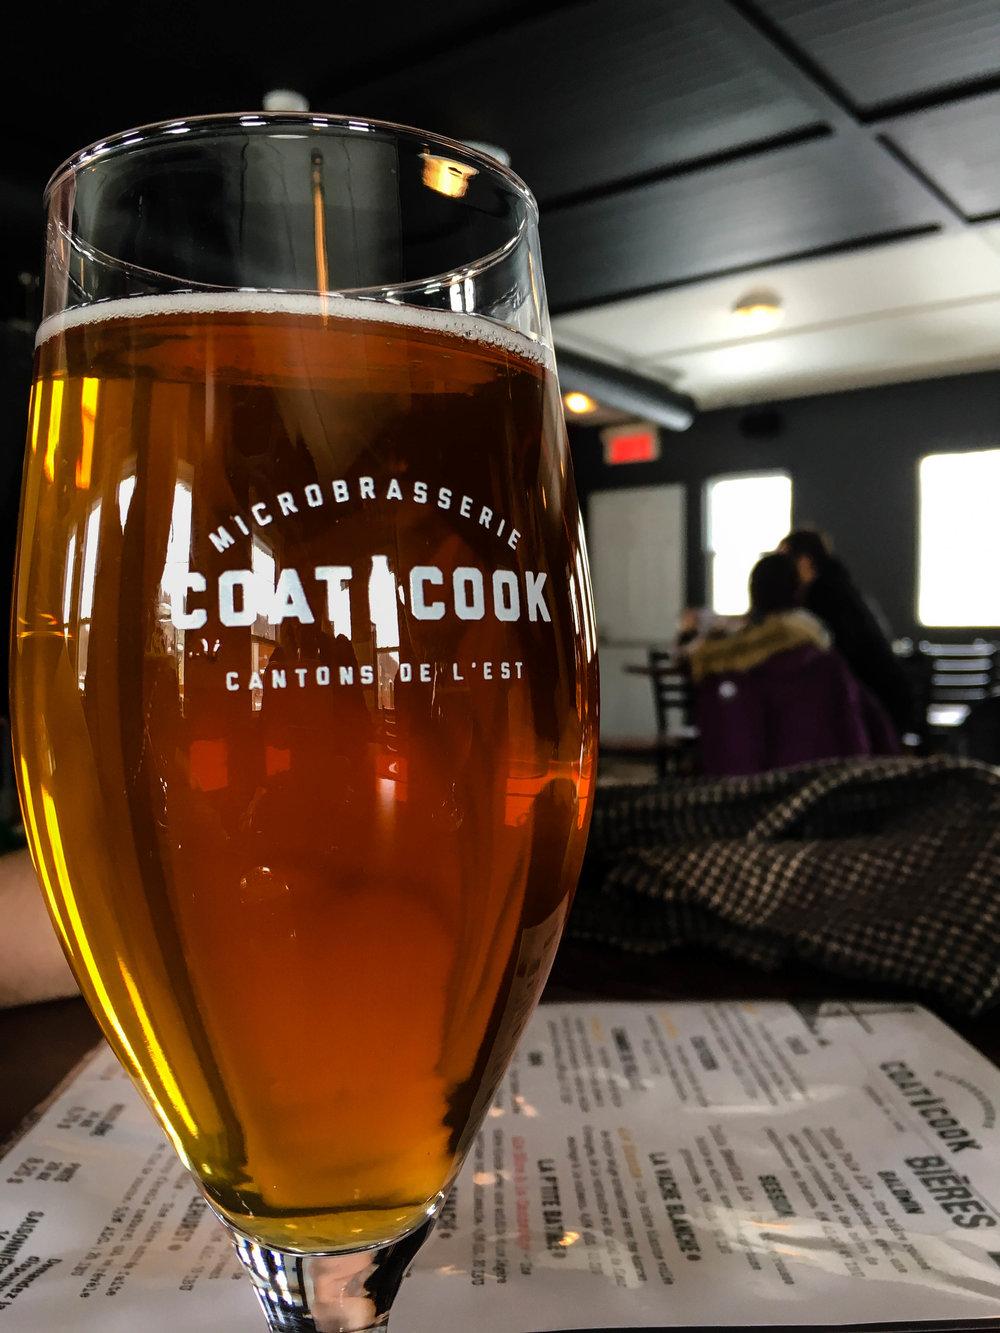 Coaticook brewery